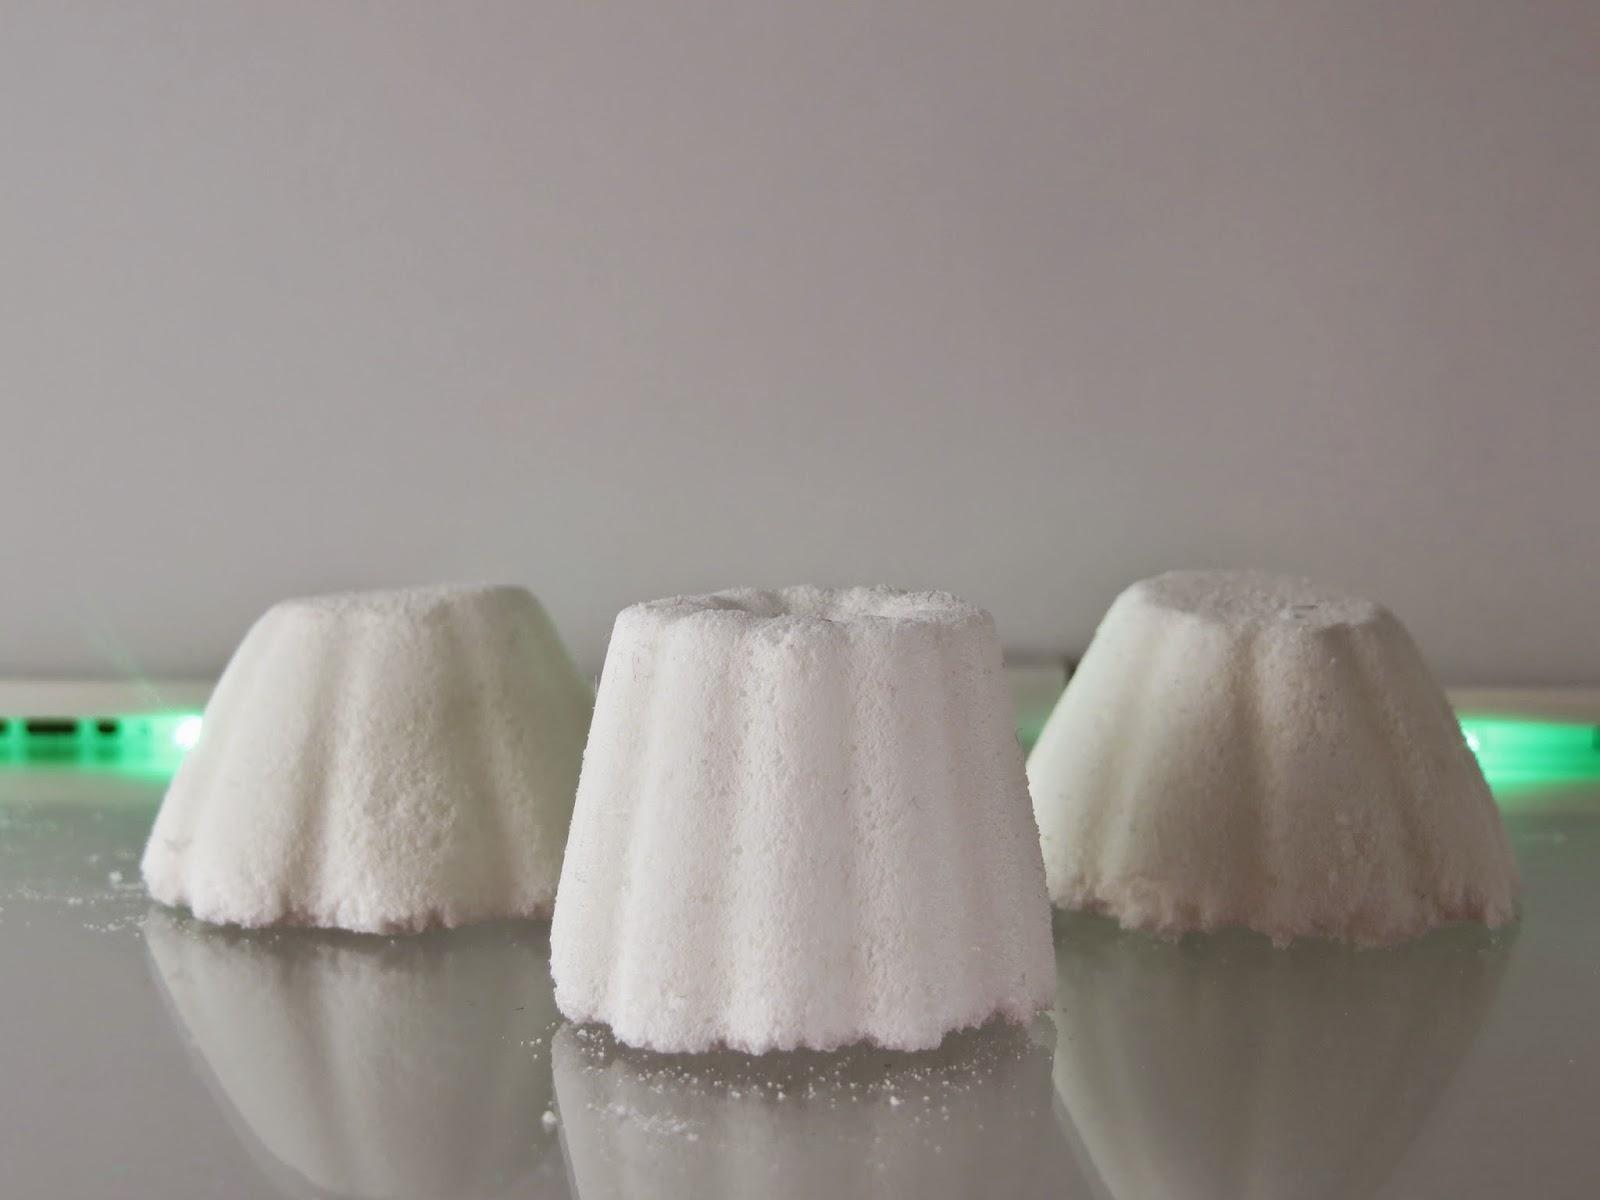 biotytille galets effervescents pour le nettoyage des wc. Black Bedroom Furniture Sets. Home Design Ideas